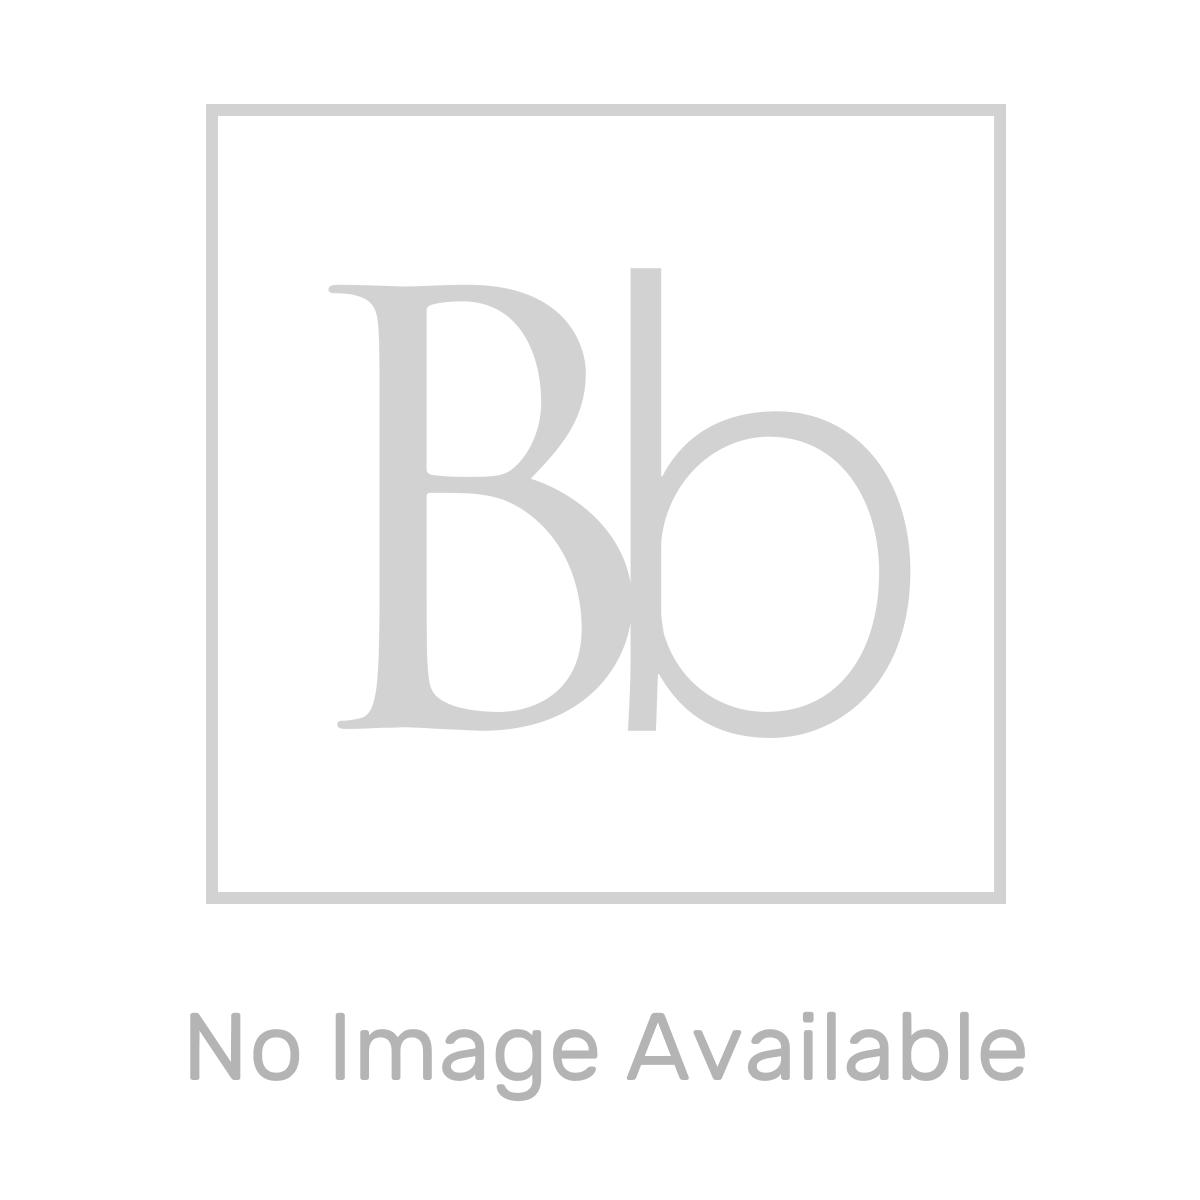 Premier Chrome Square Ladder Towel Rail